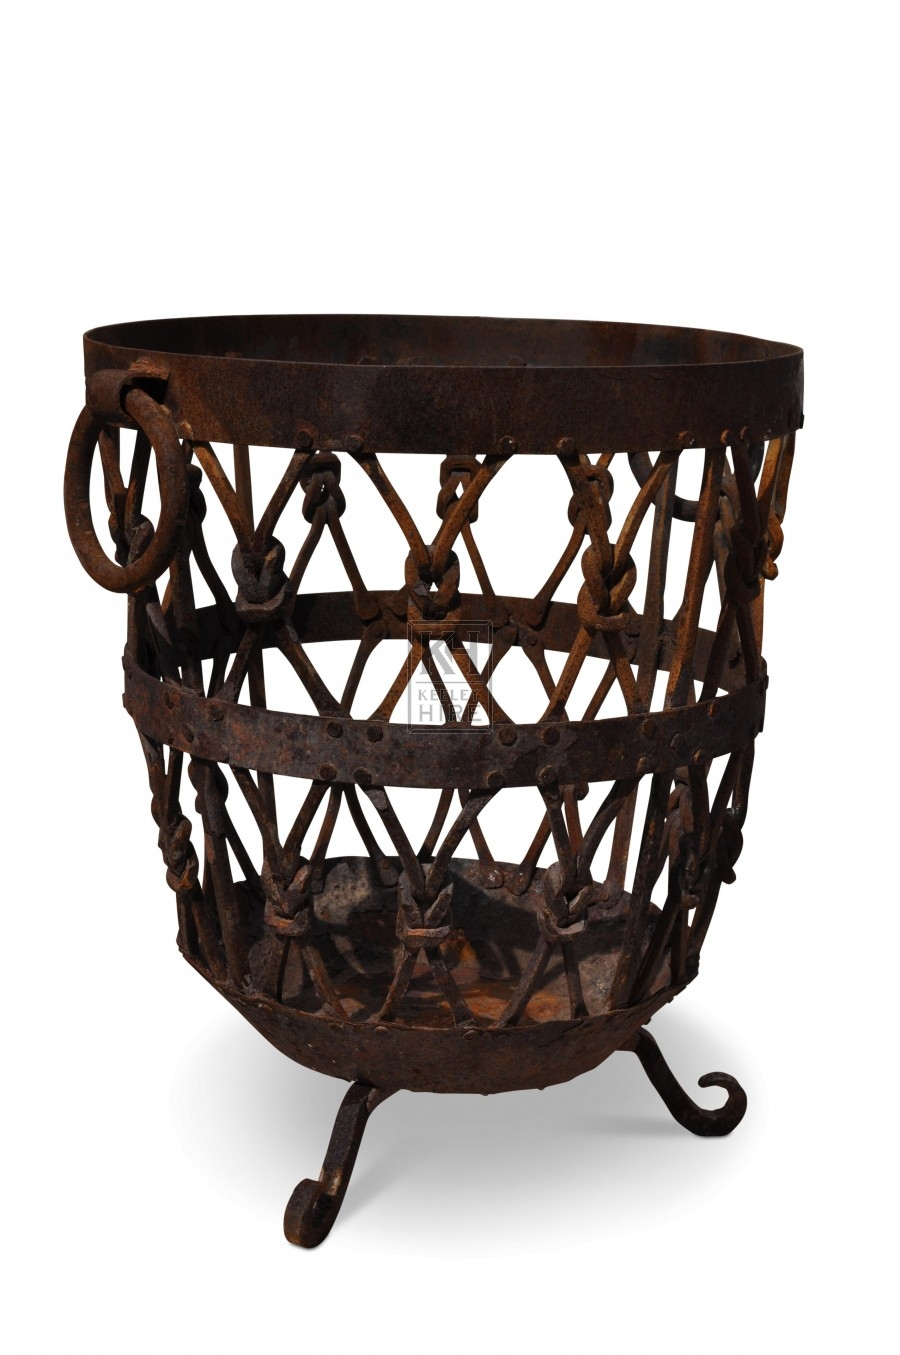 Medium Ornate Iron Brazier